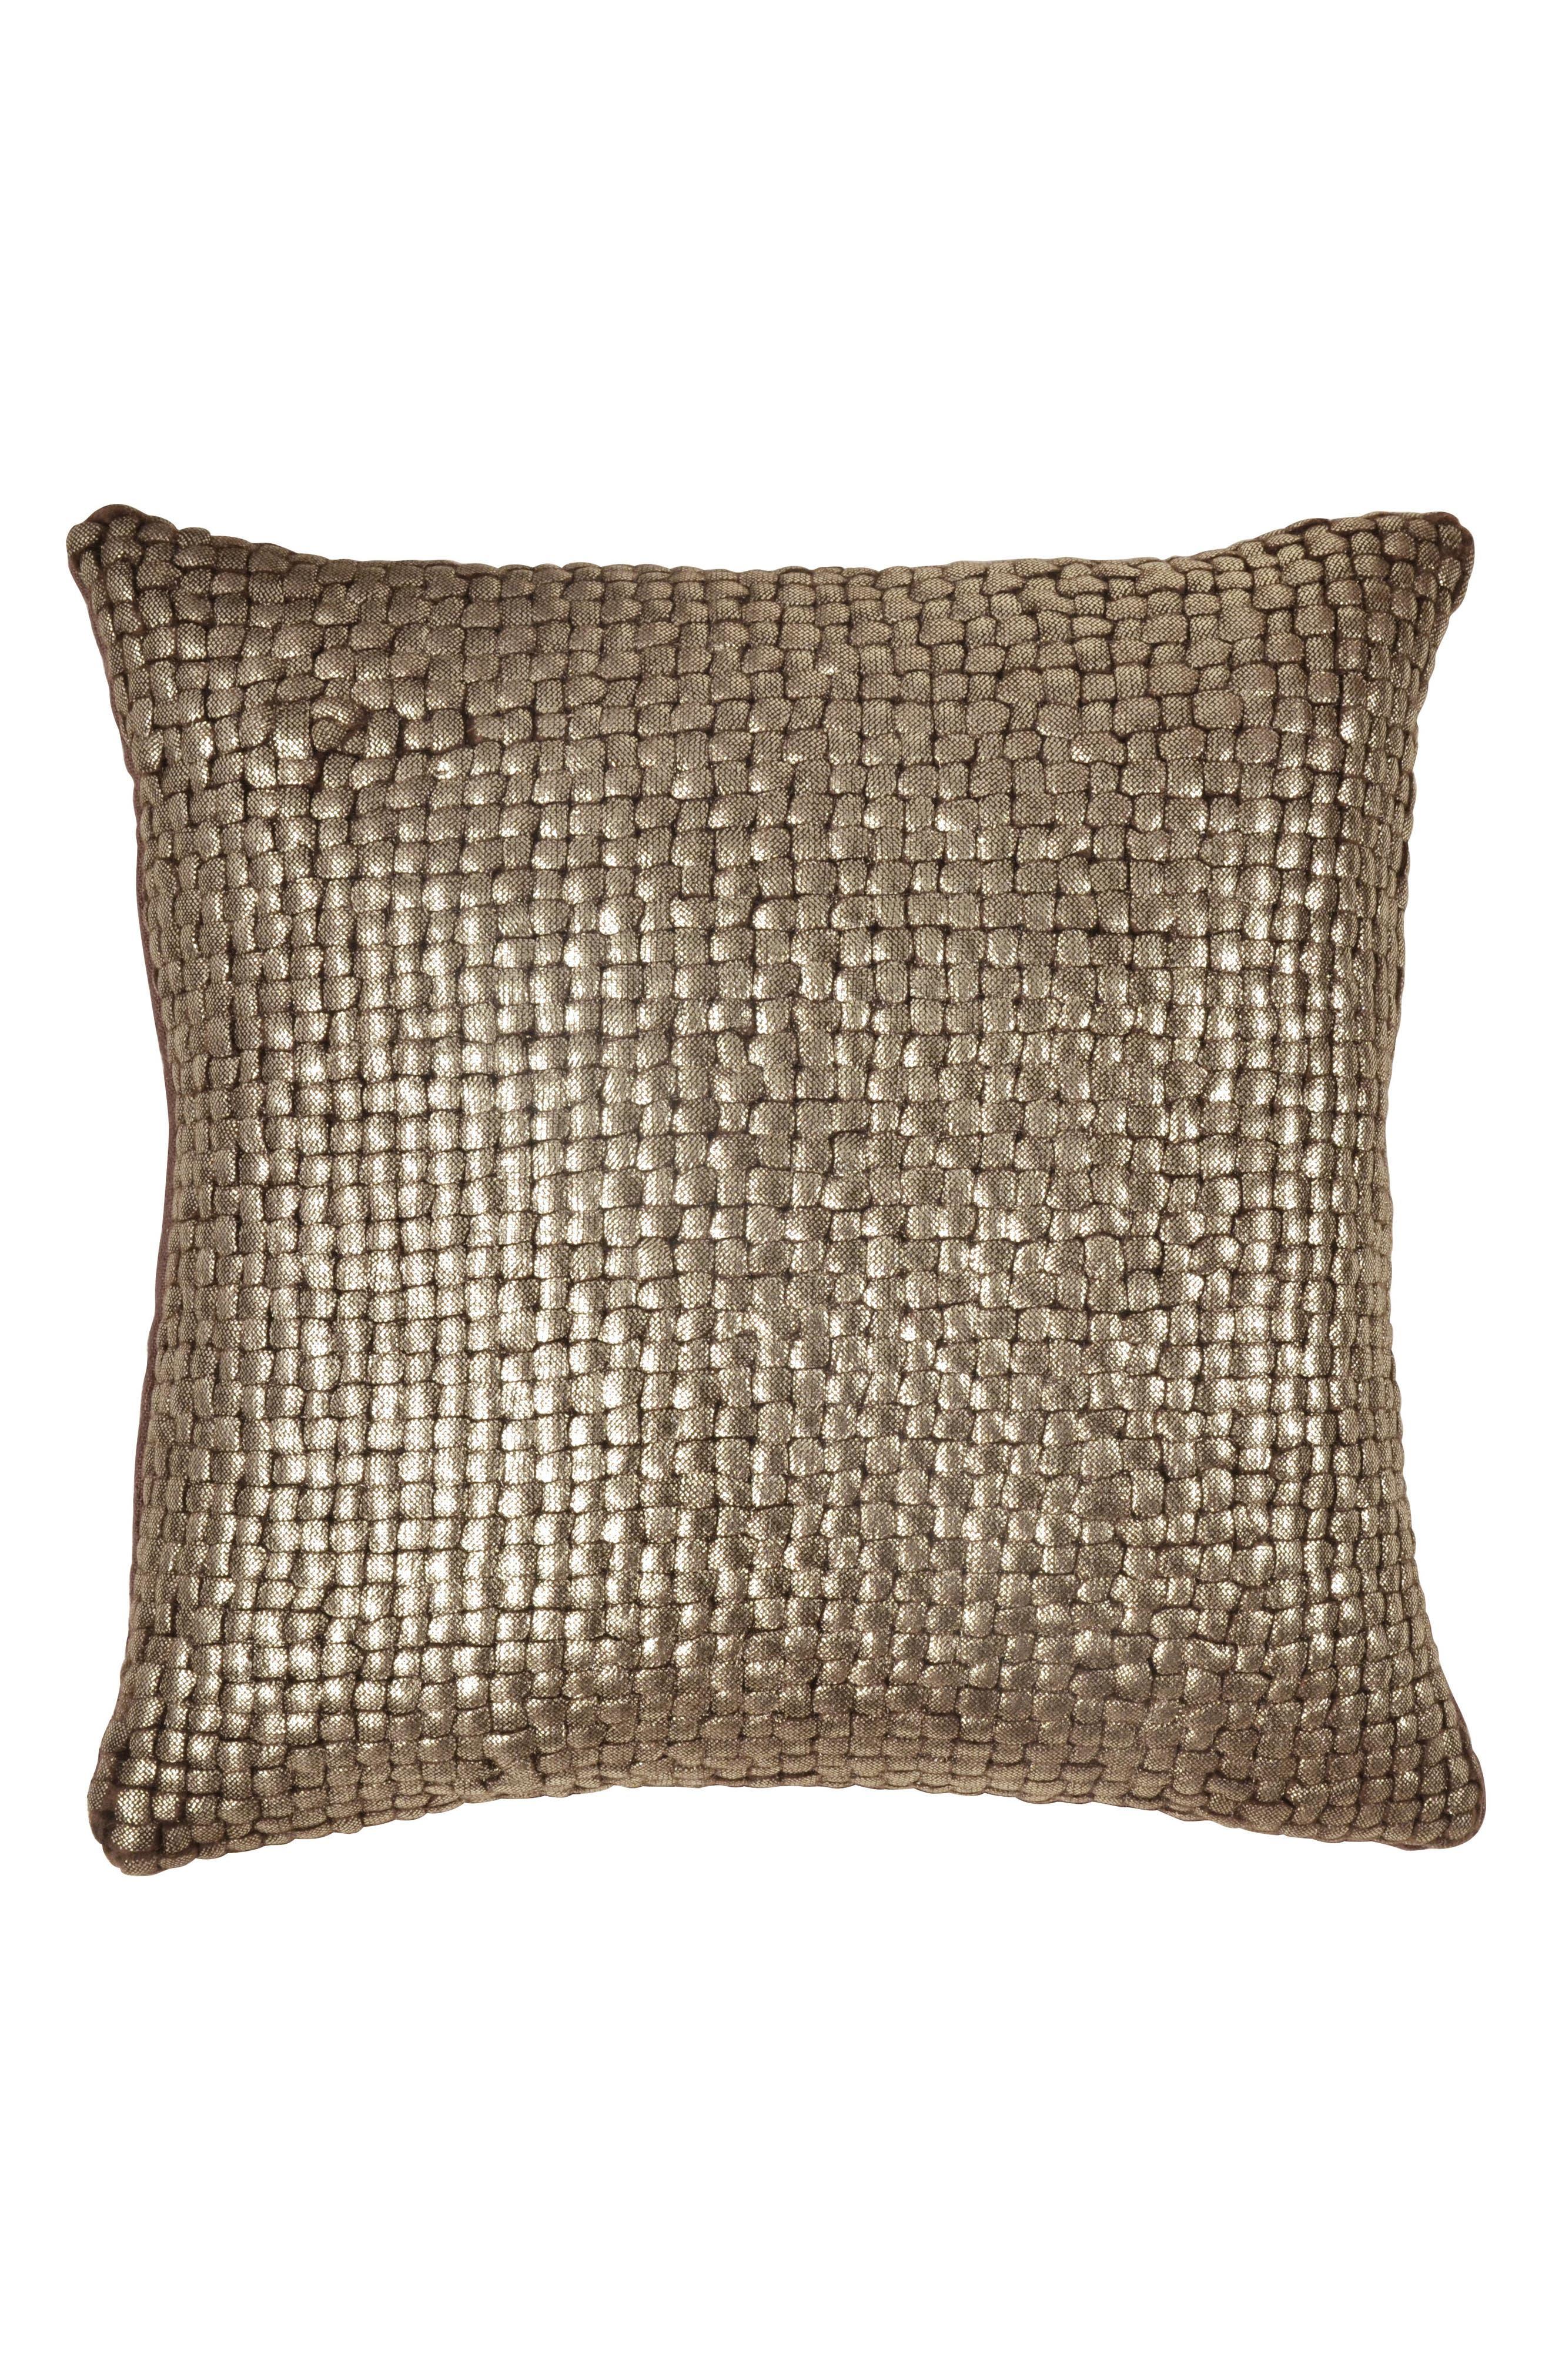 MICHAEL ARAM Metallic Basket Weave Accent Pillow, Main, color, CHOCOLATE